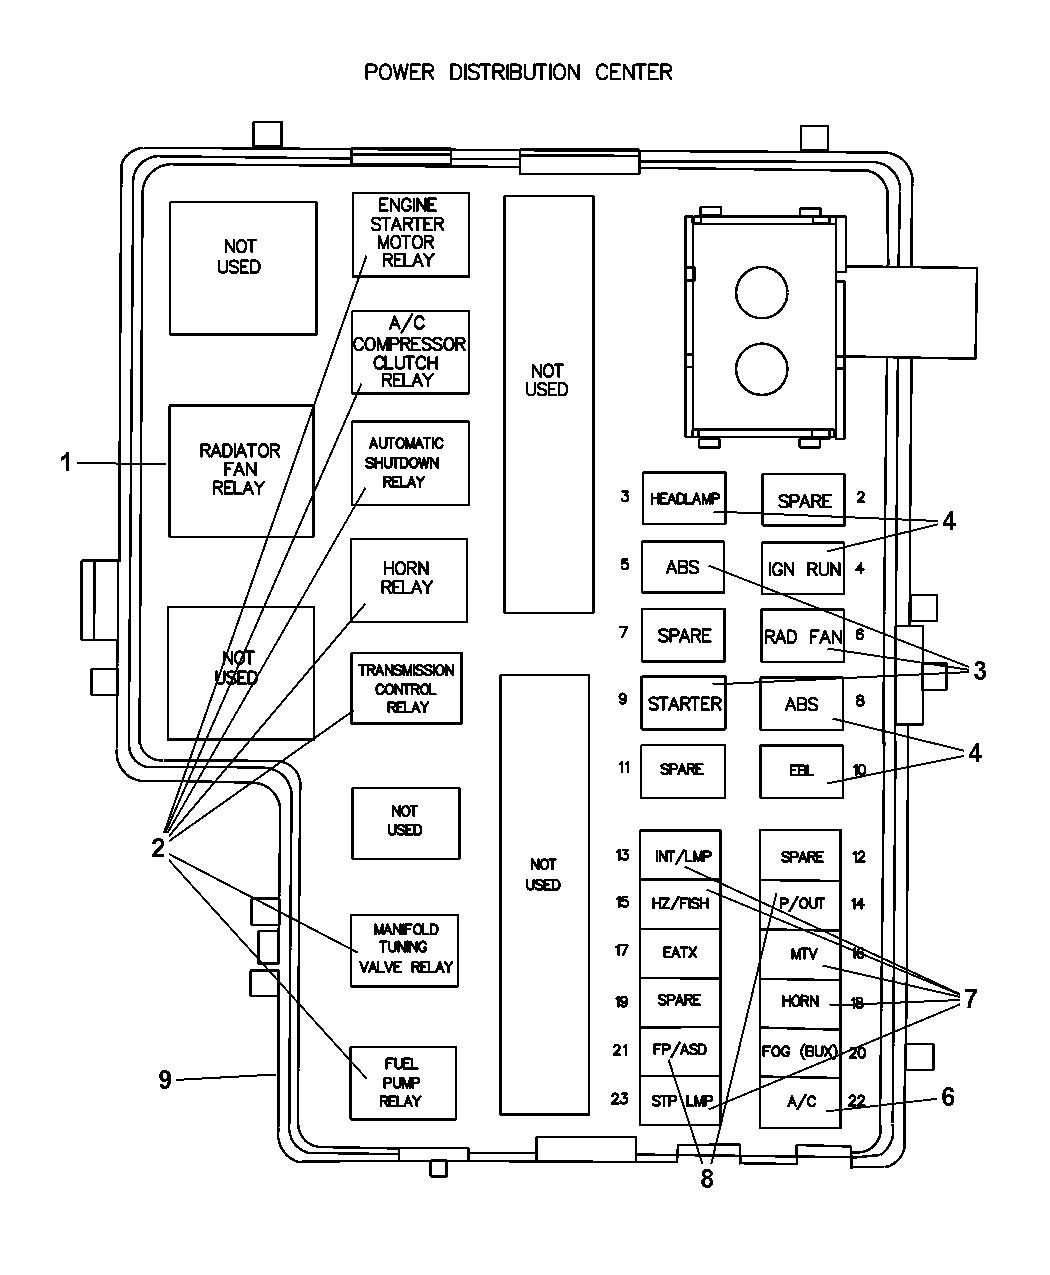 01 Dodge Neon Fuse Diagram